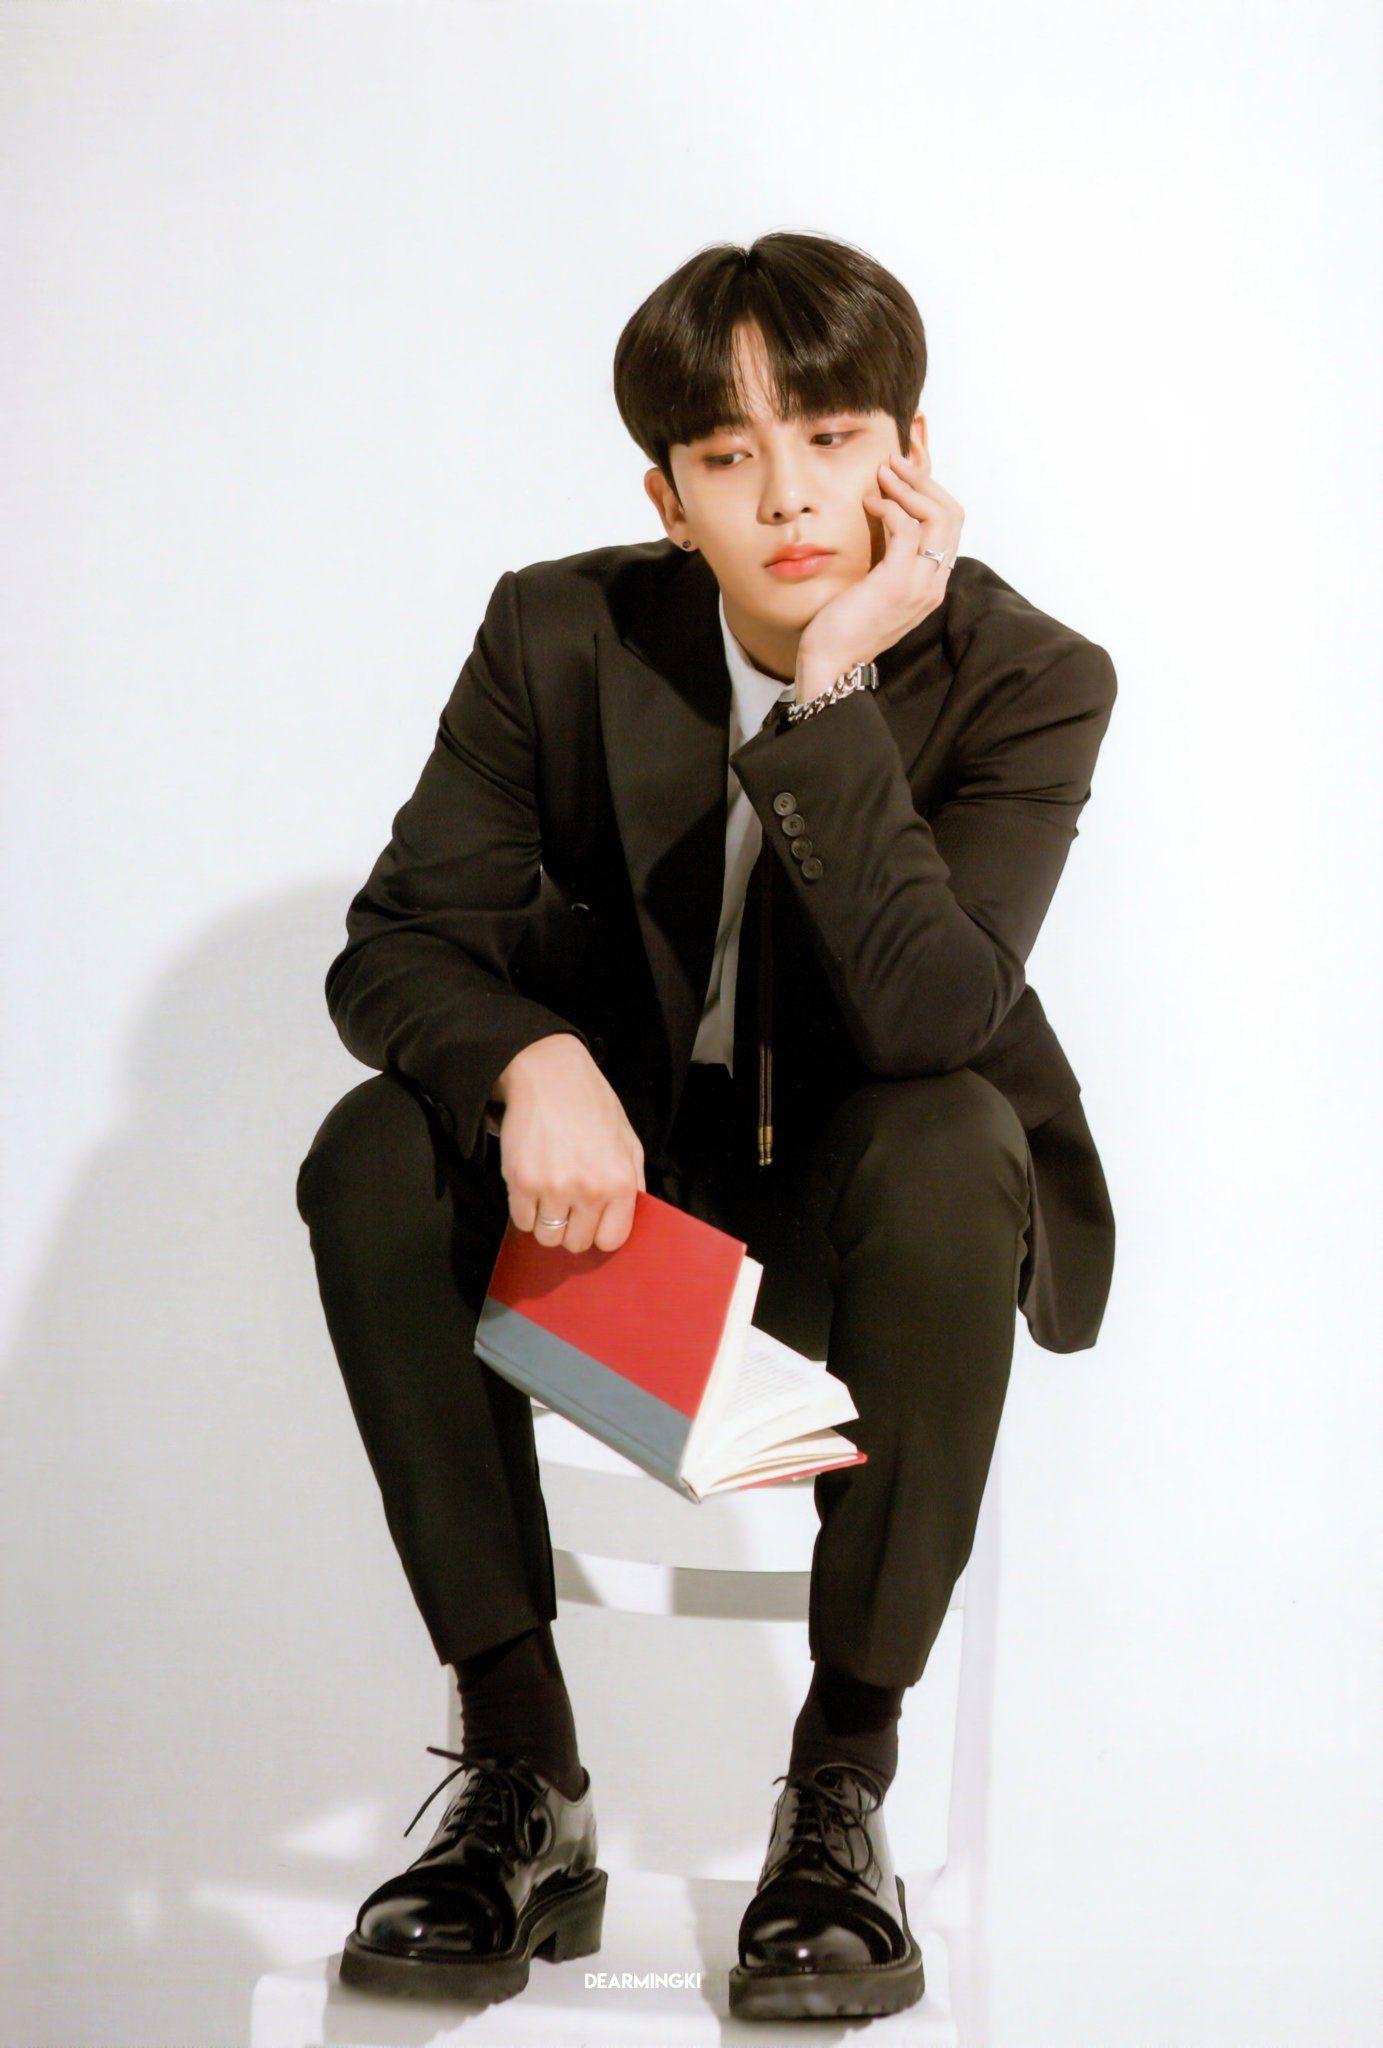 Pin By Aalyiah On Jongho Ateez In 2020 1999 Songs Kpop Memes One Team